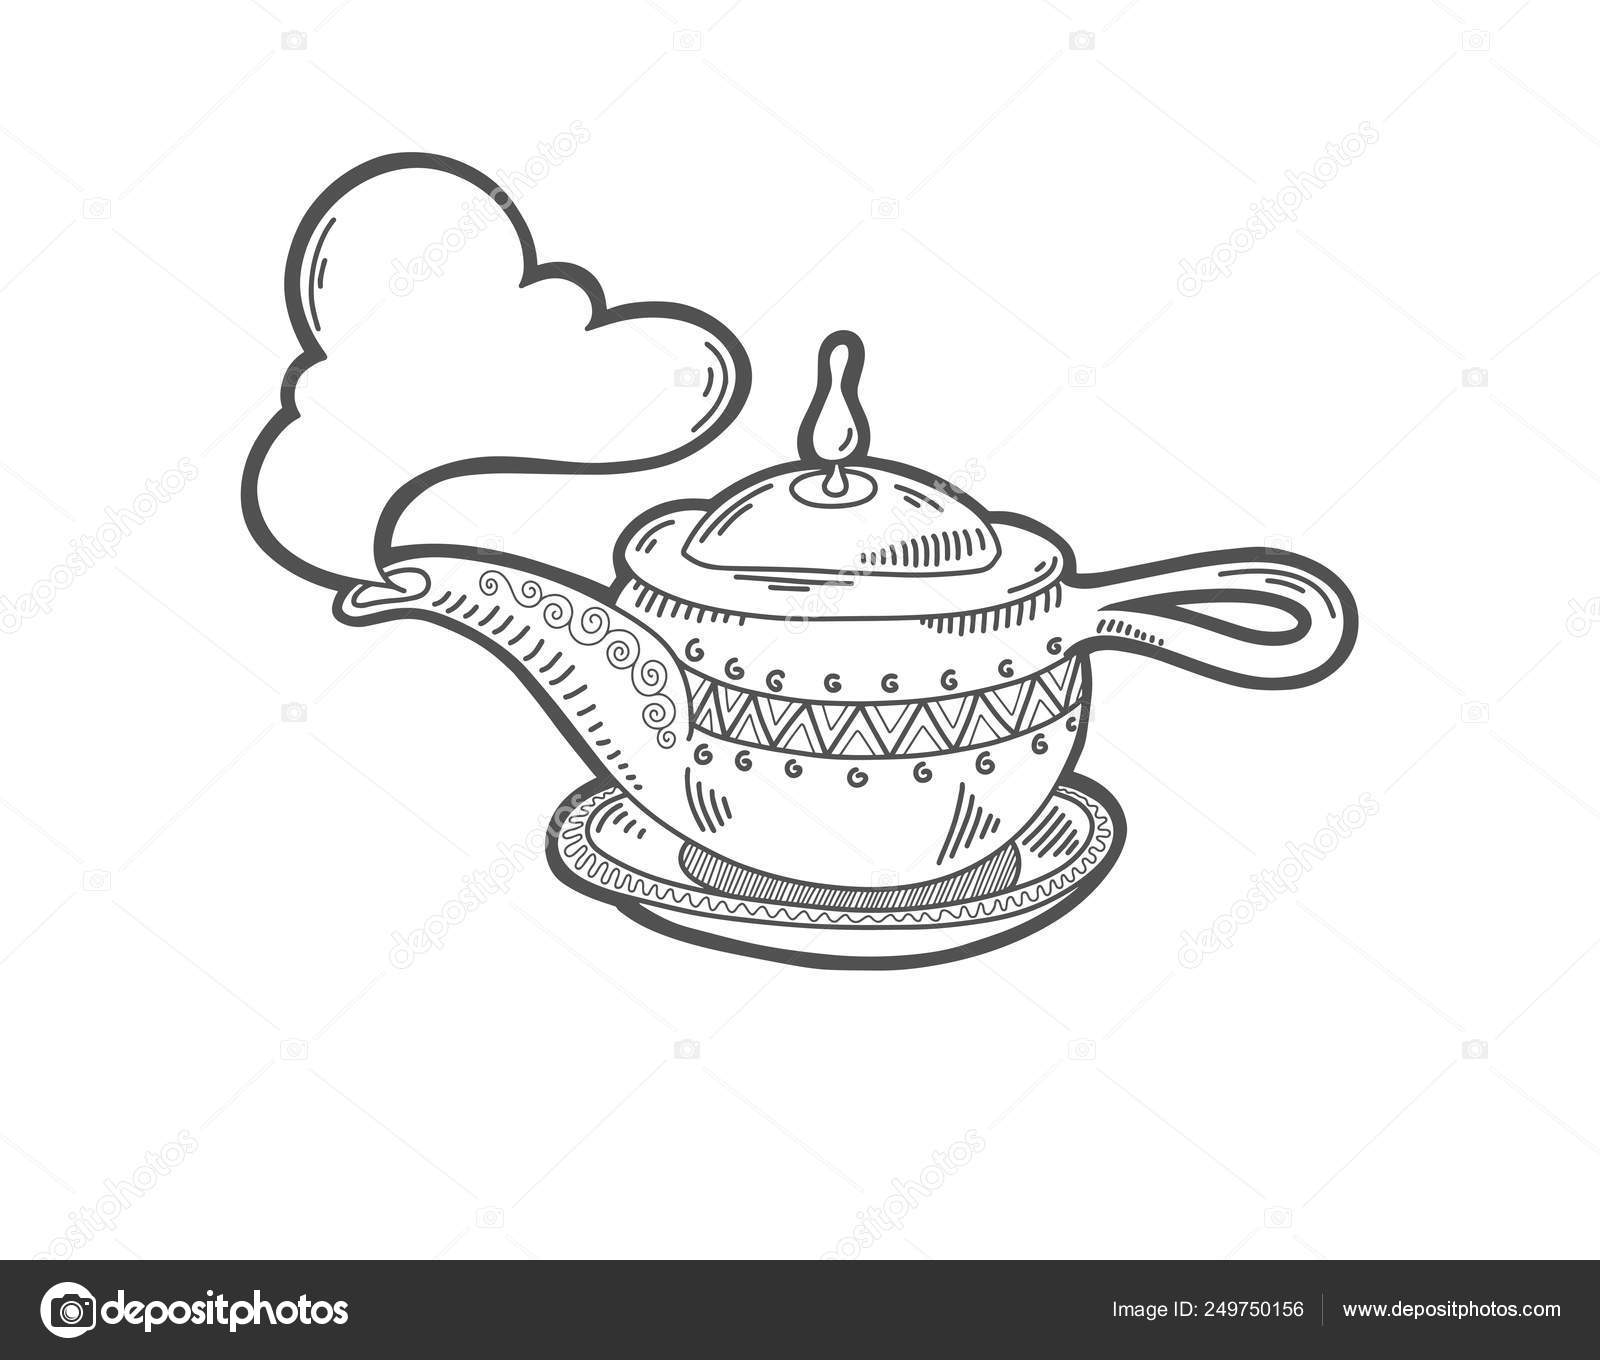 Icône De Dessin De Croquis De La Lampe Magique D Aladin